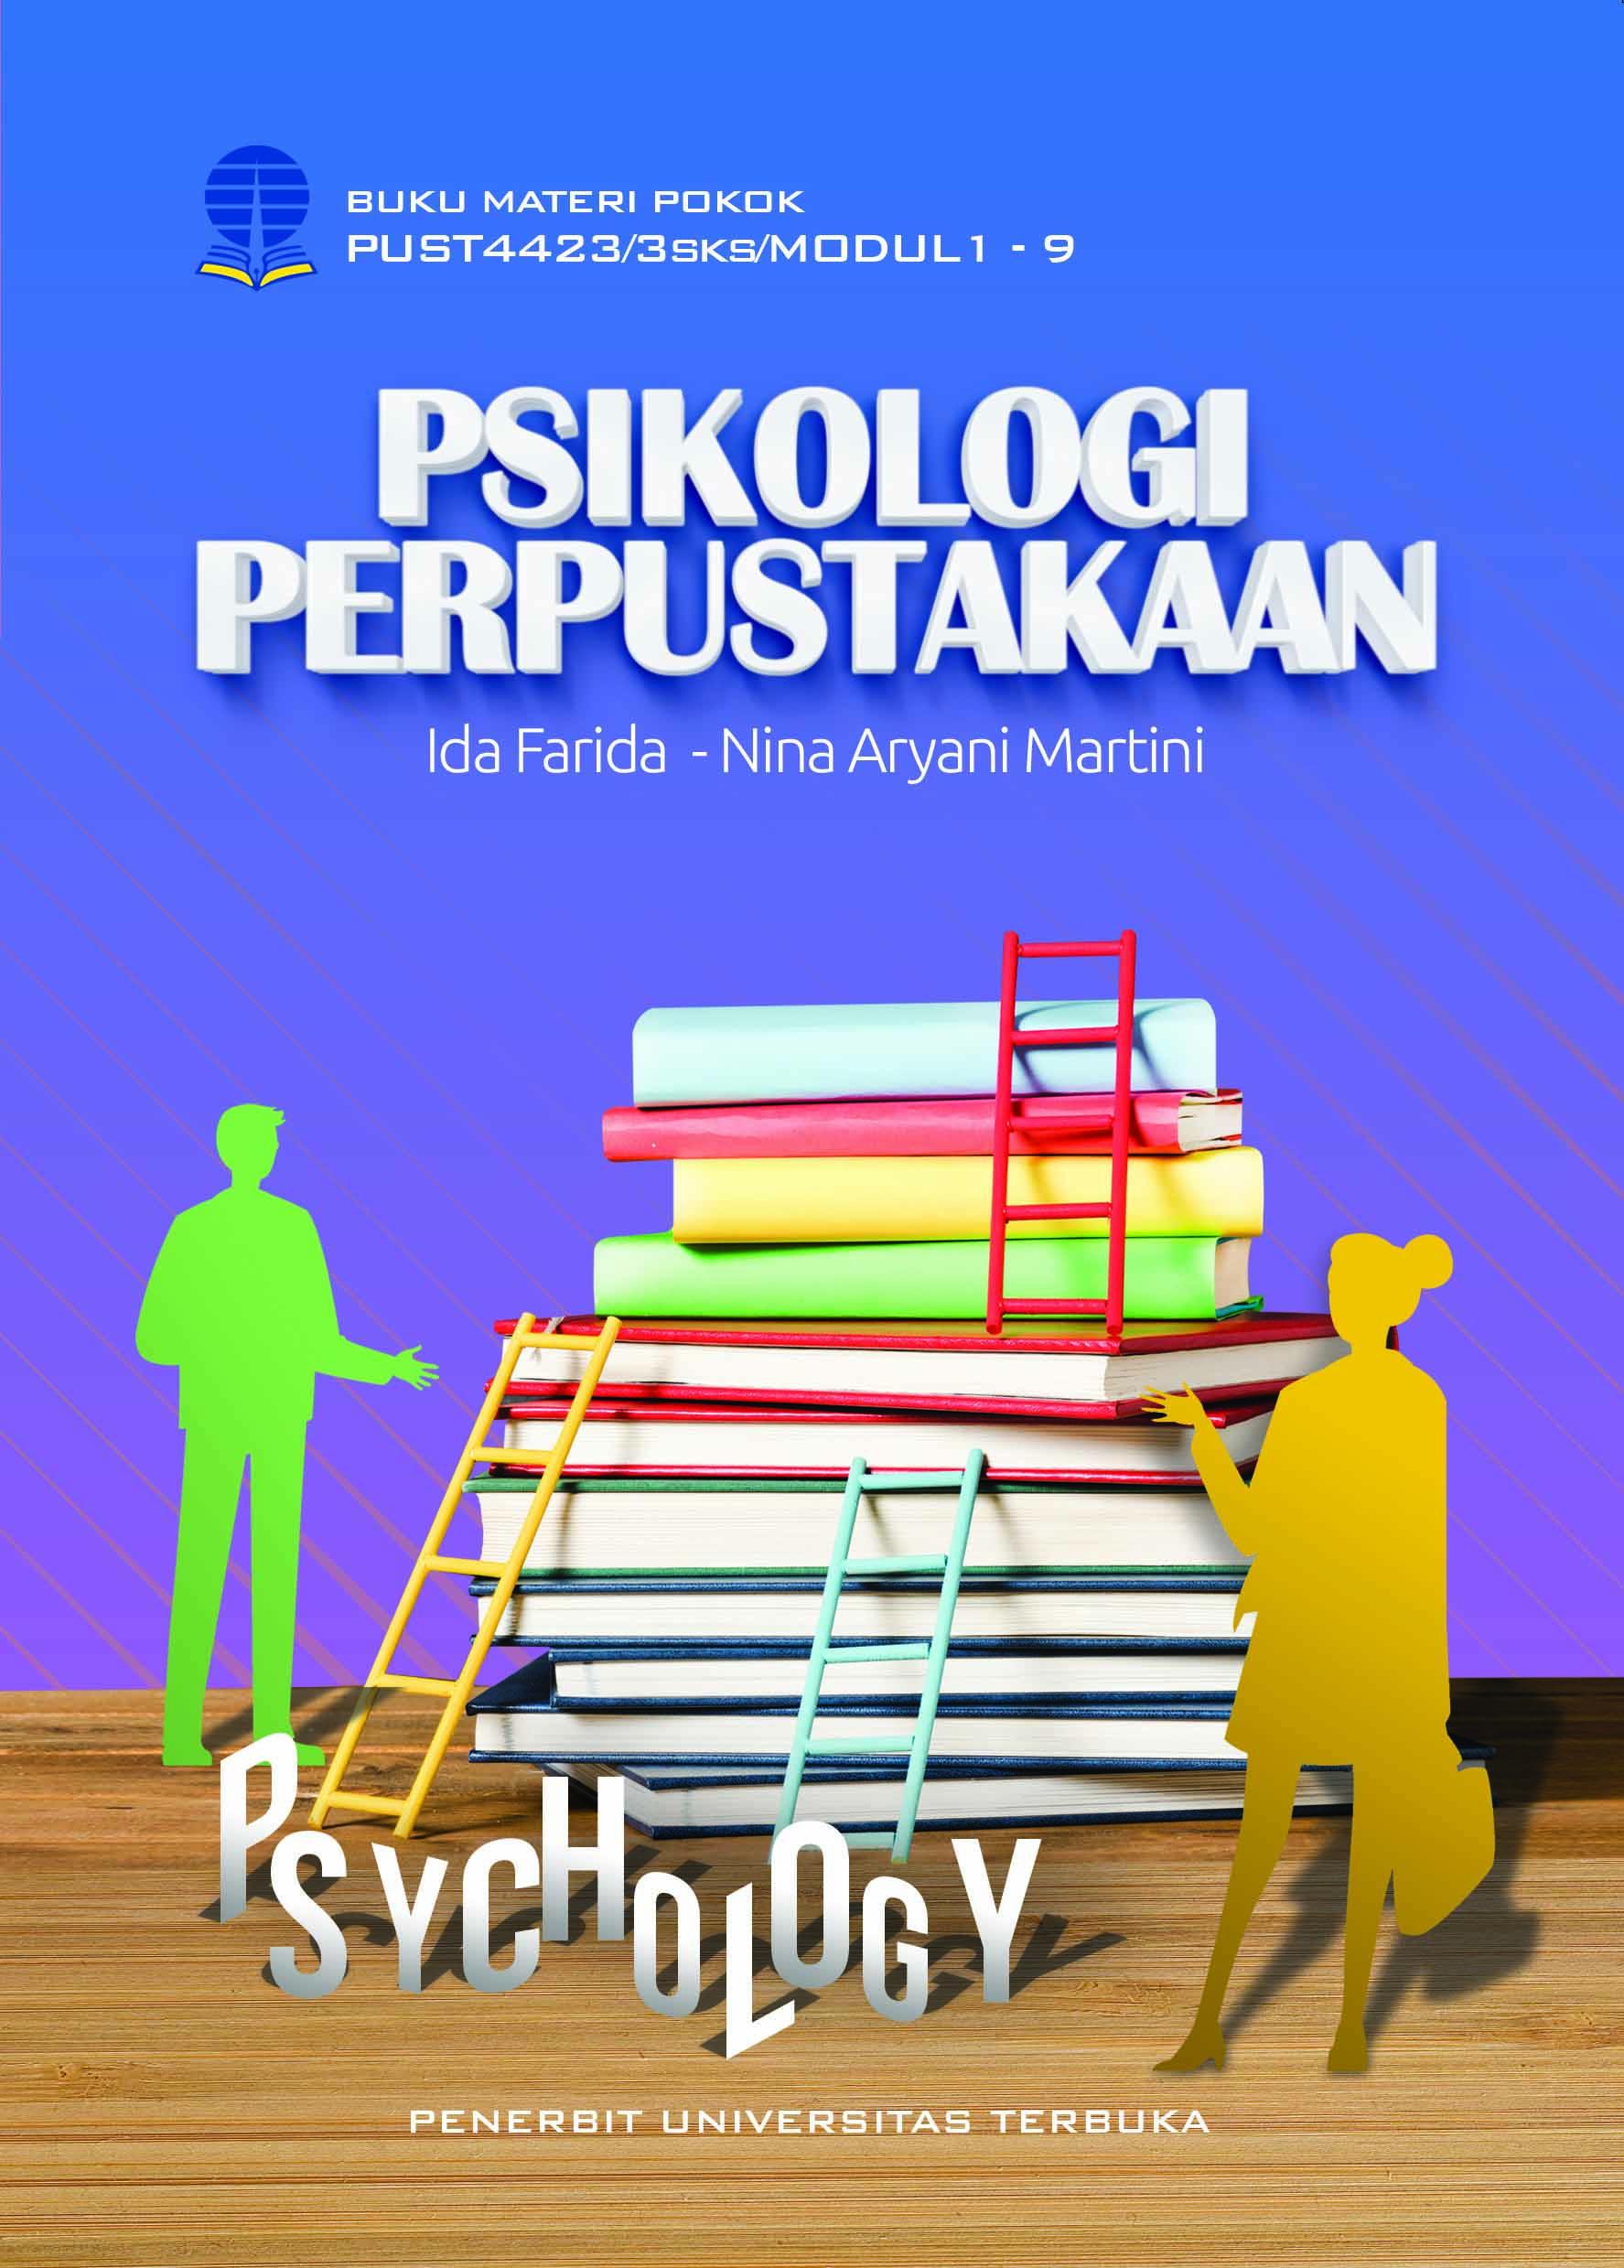 Psikologi perpustakaan [sumber elektronis]